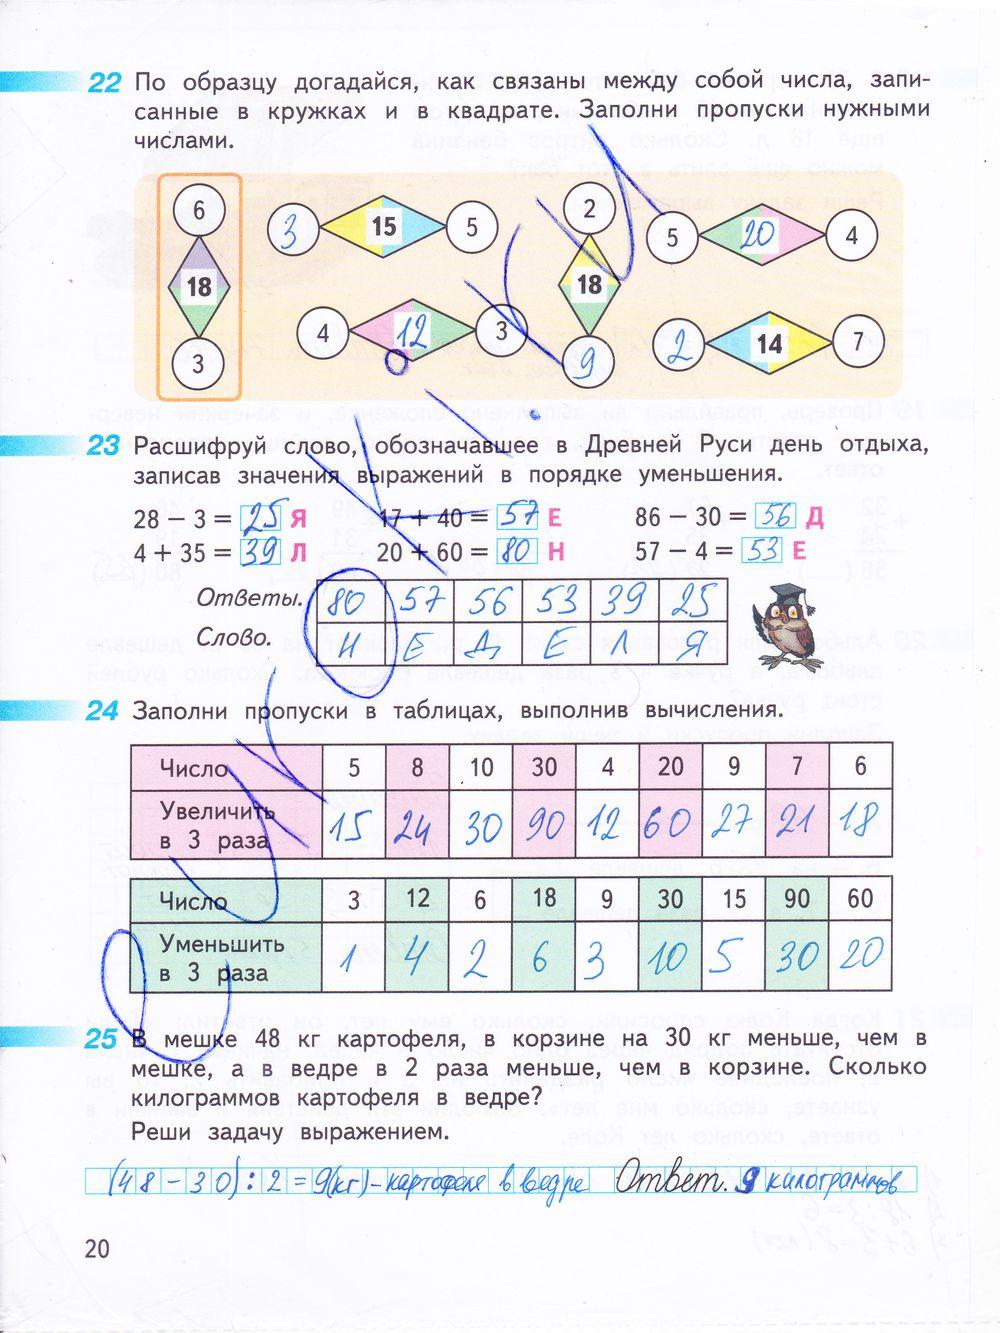 Discovery workbook 5 класс сделанная